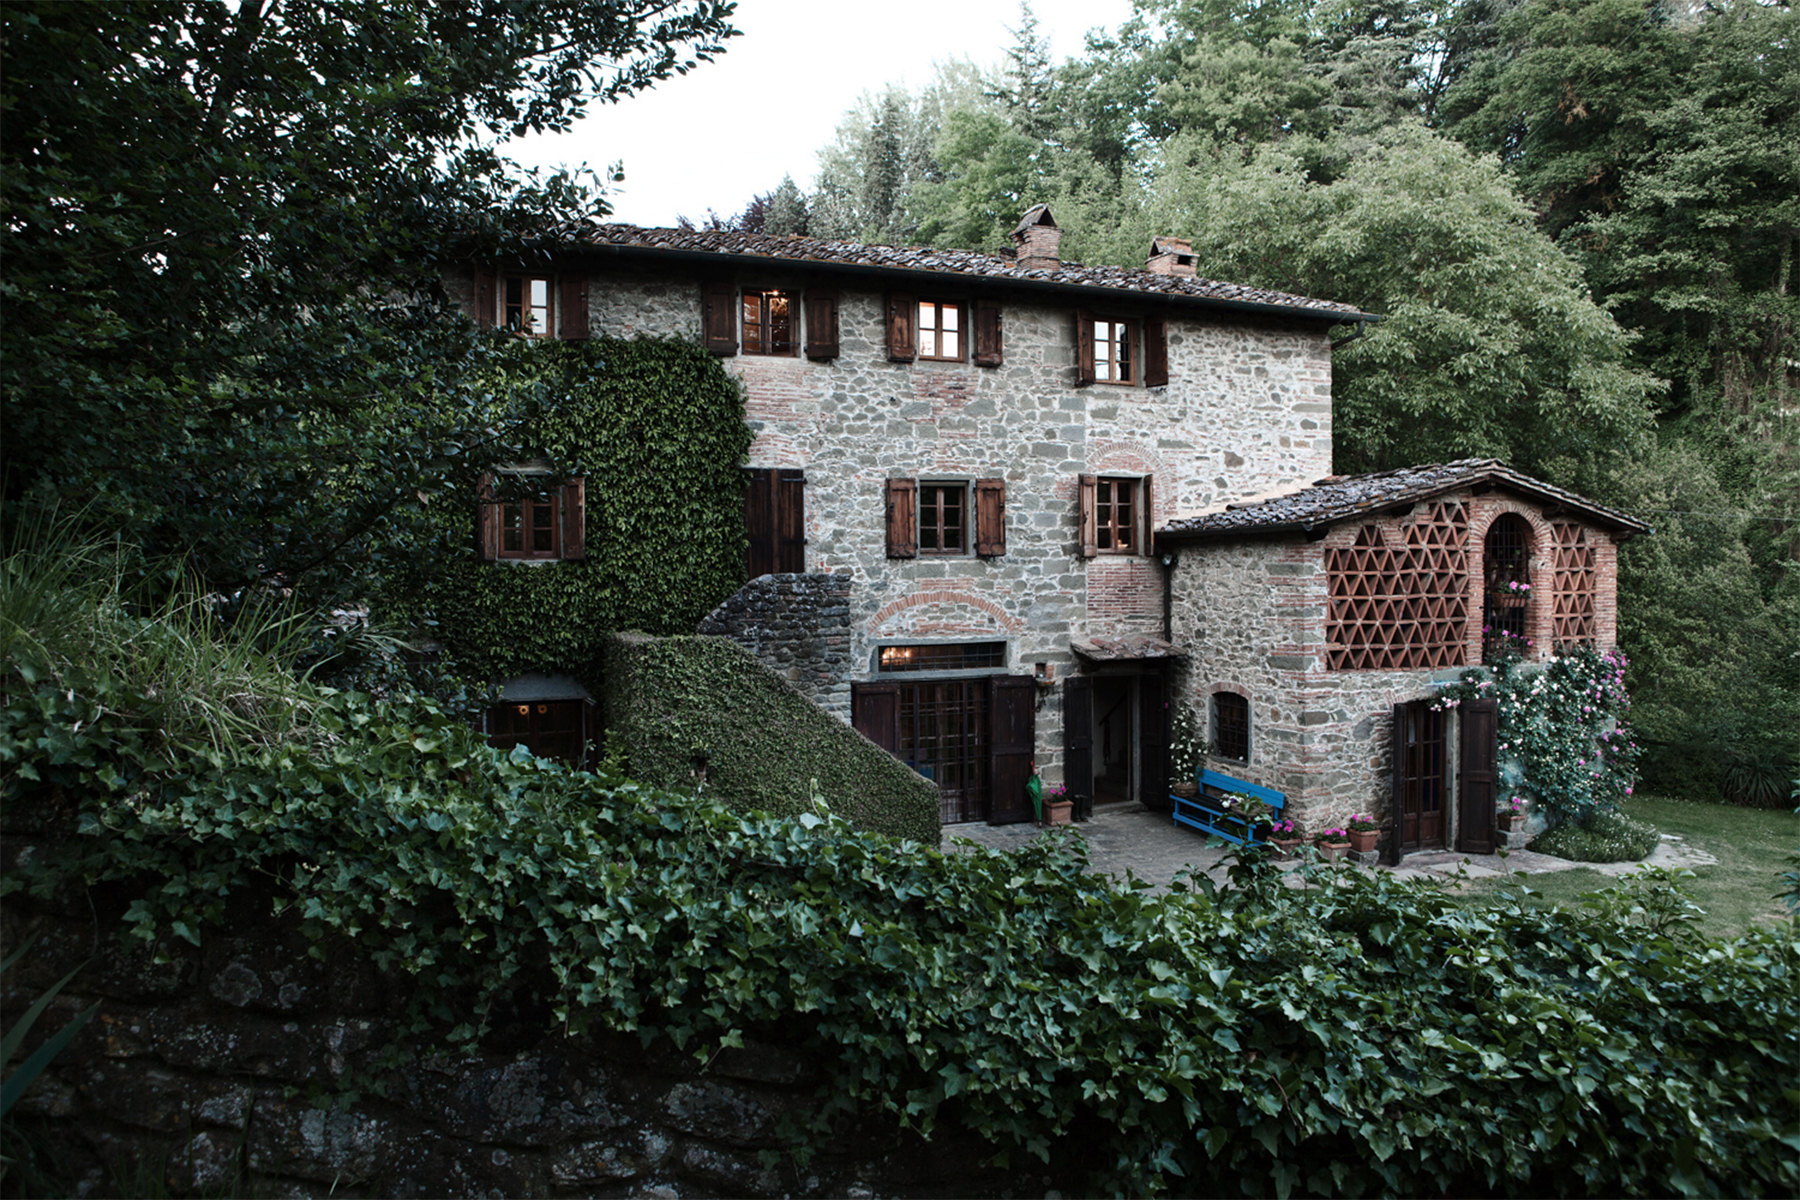 15Th century stone watermill